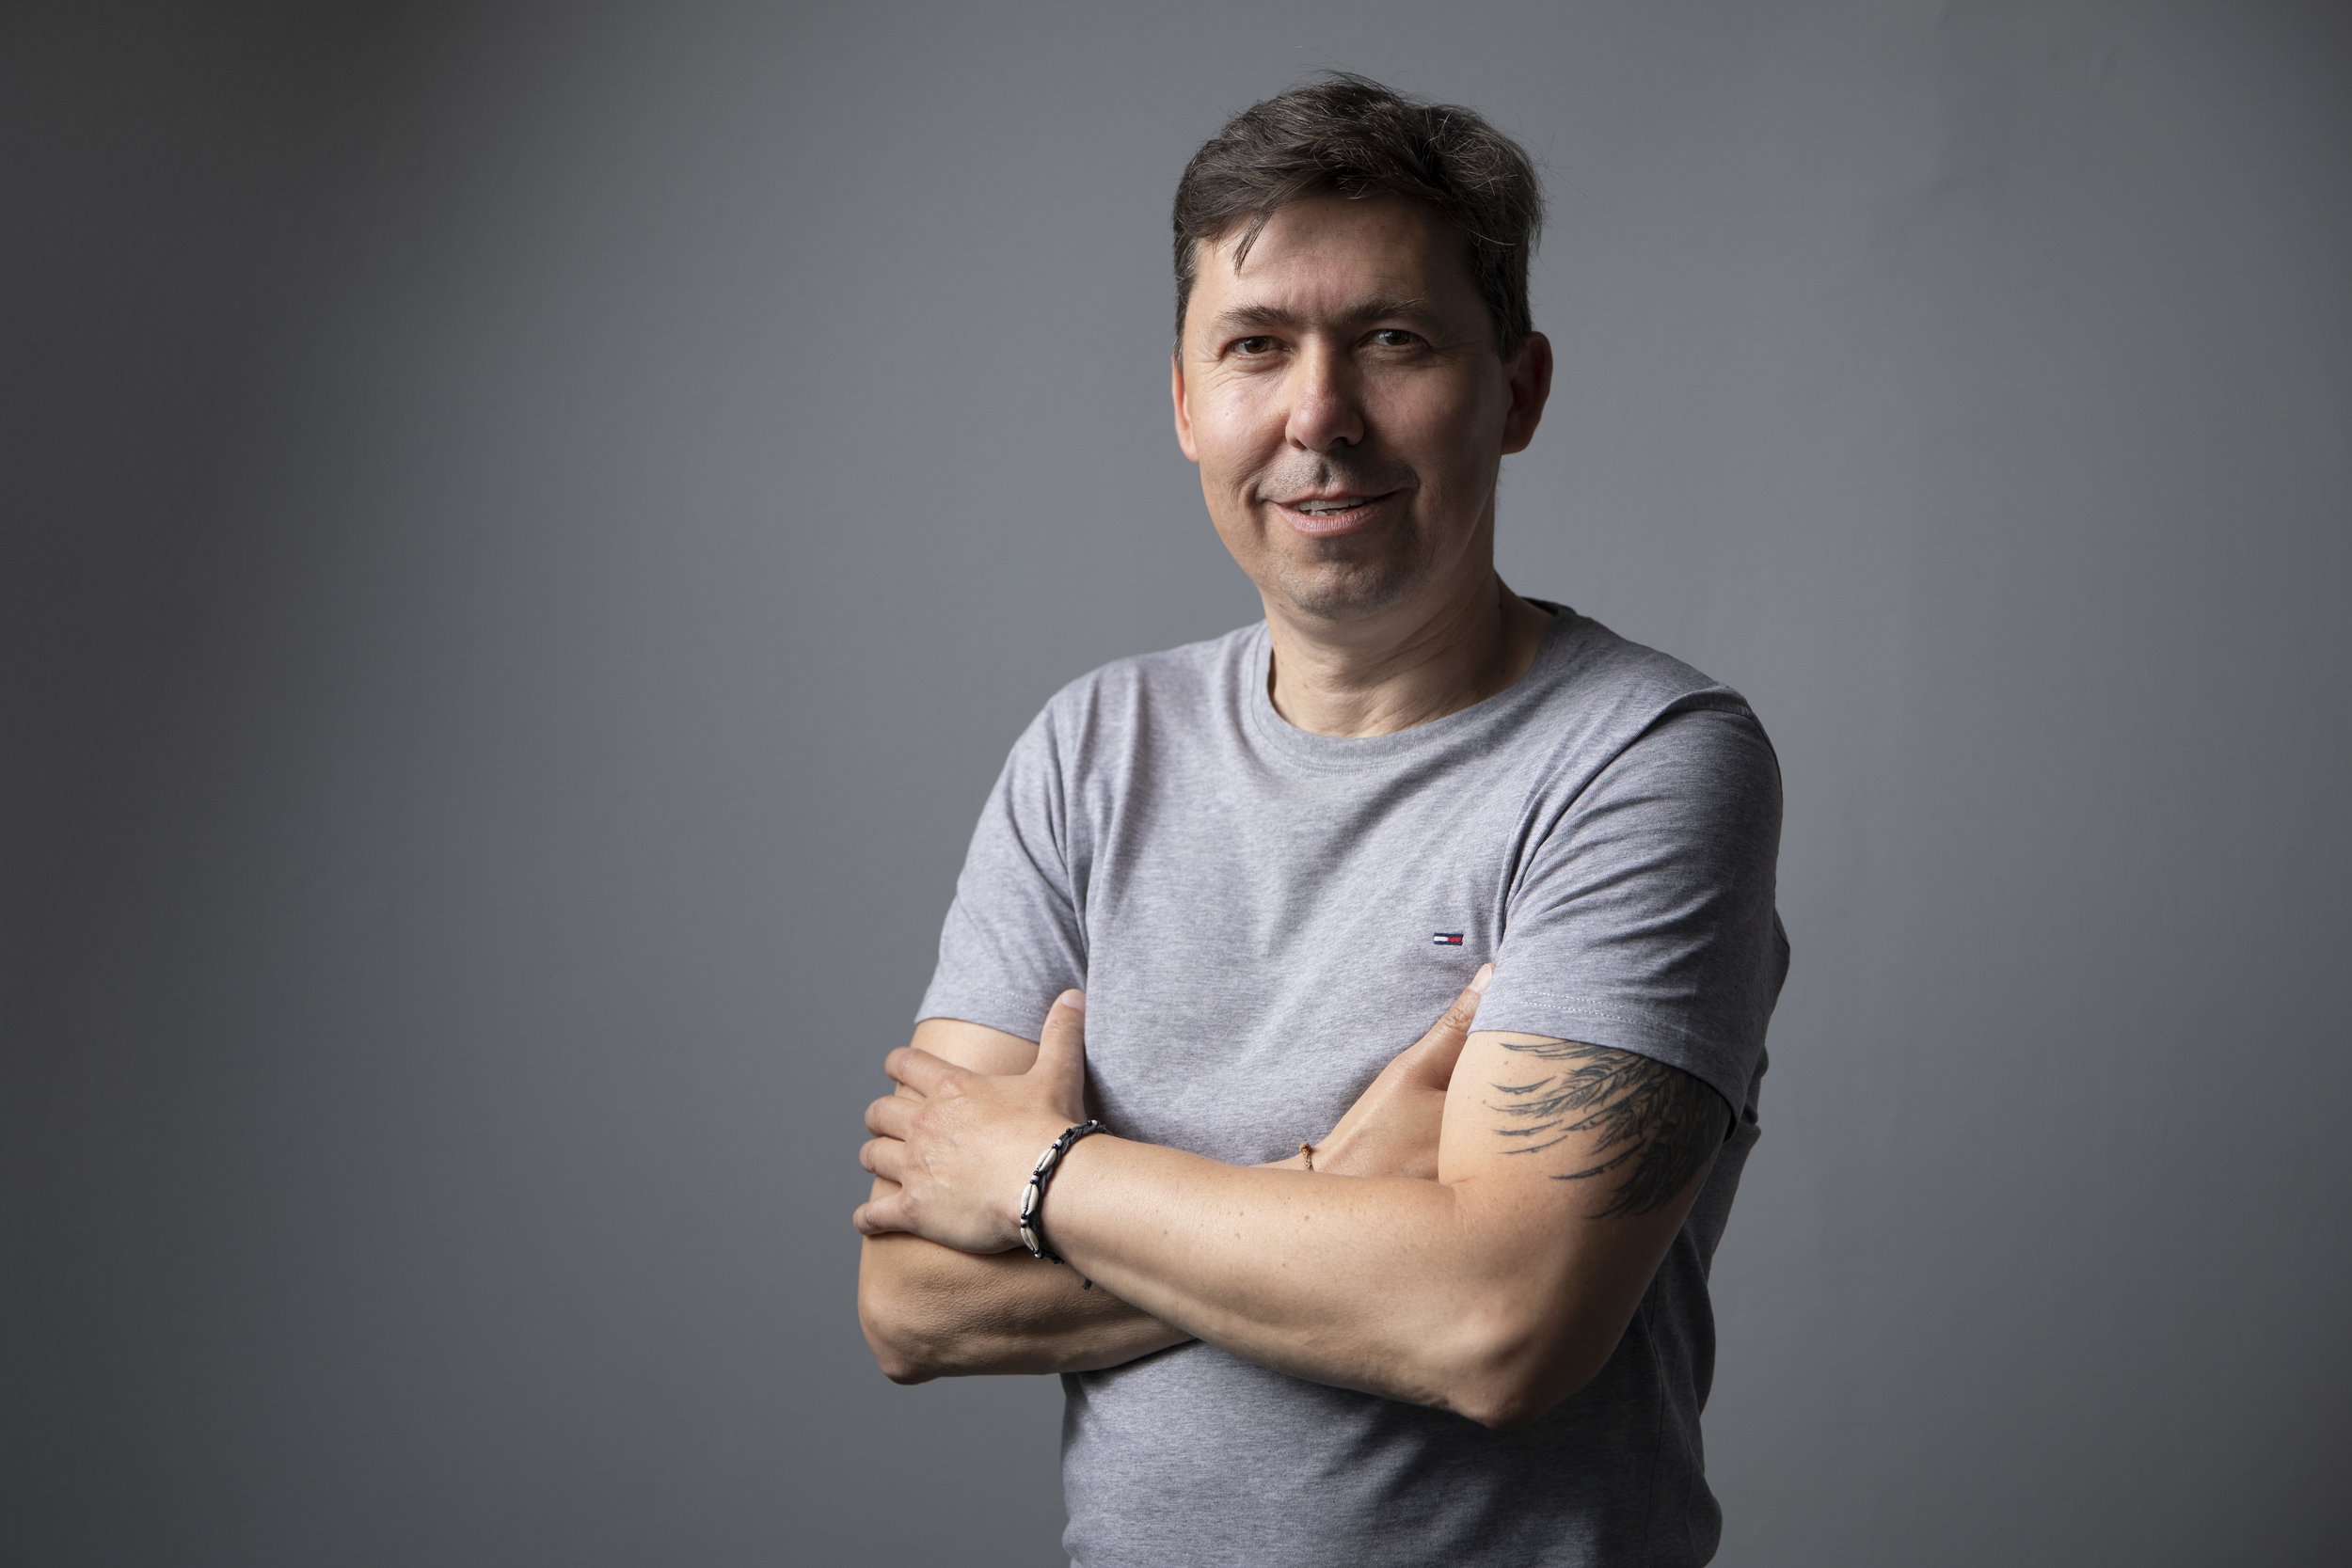 ing. Petr Žídek